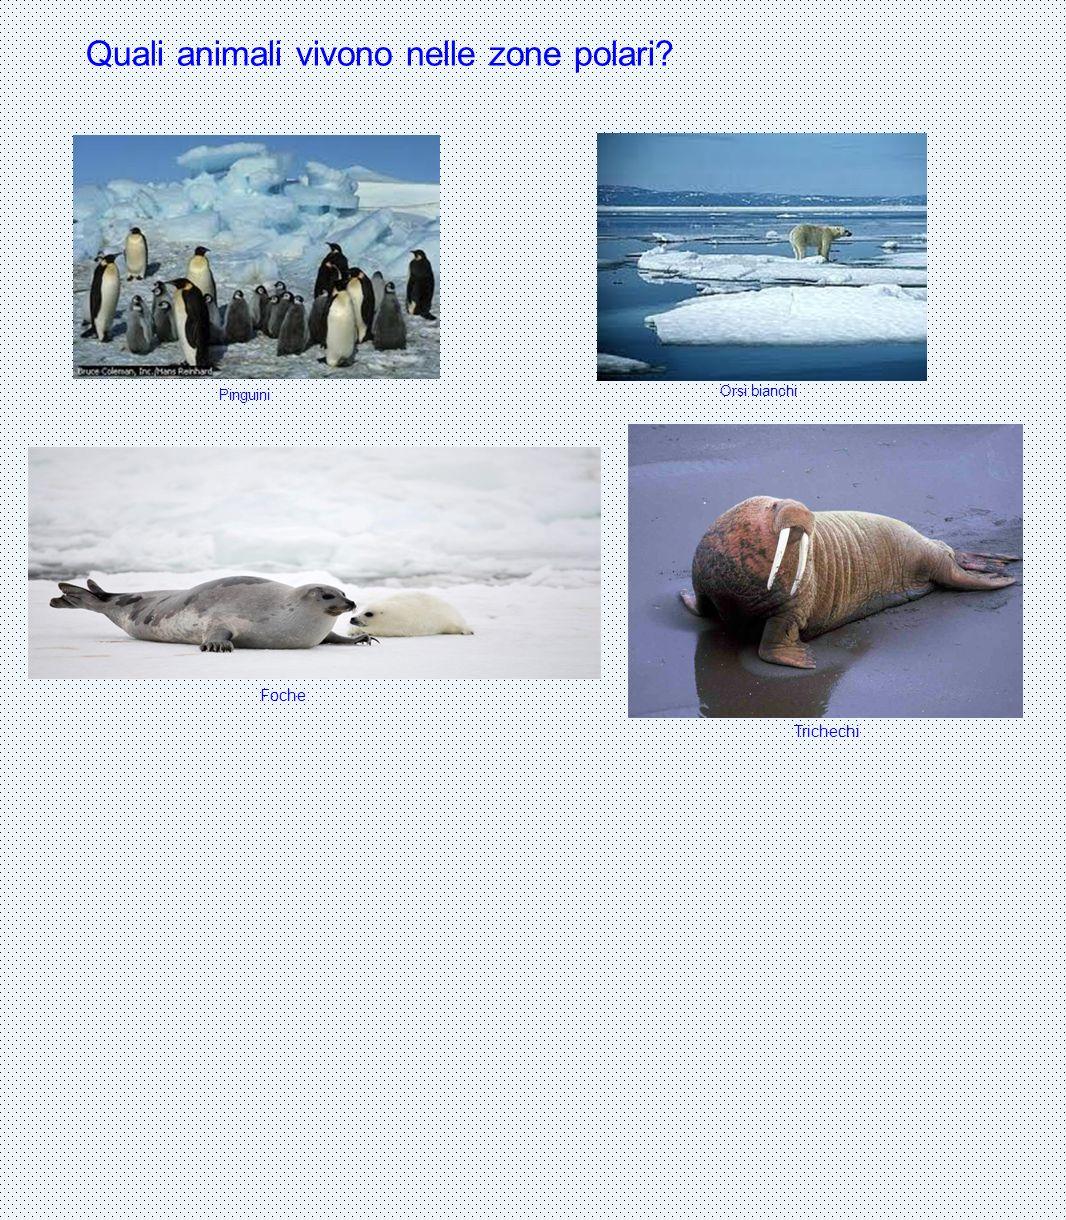 Quali animali vivono nelle zone polari